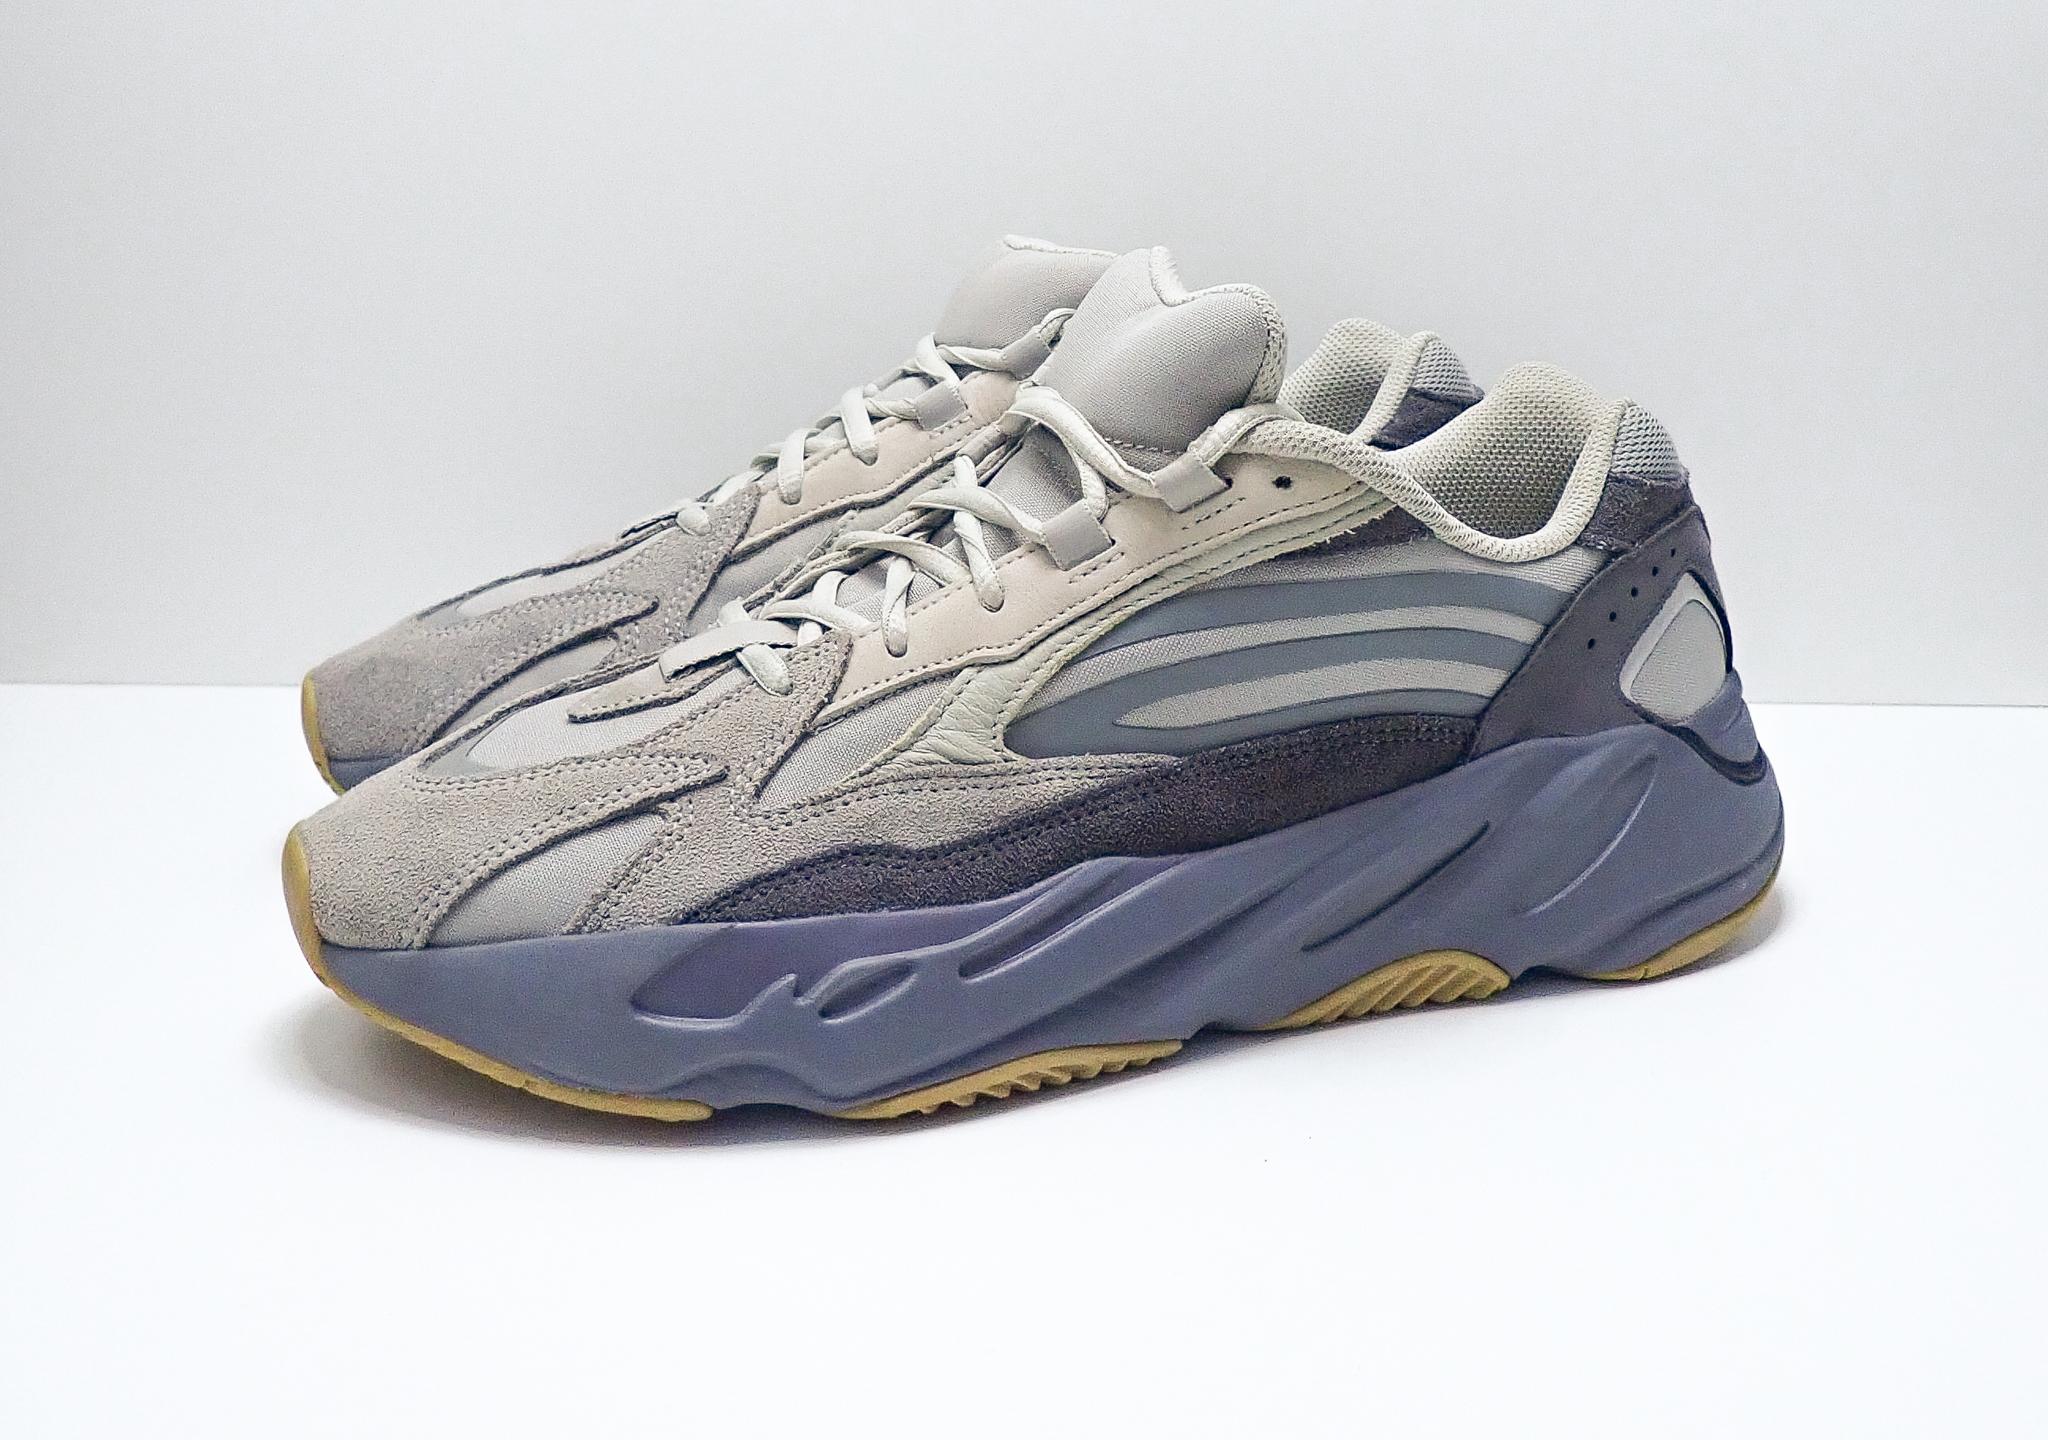 Adidas Yeezy Boost 700 V2 Tephra